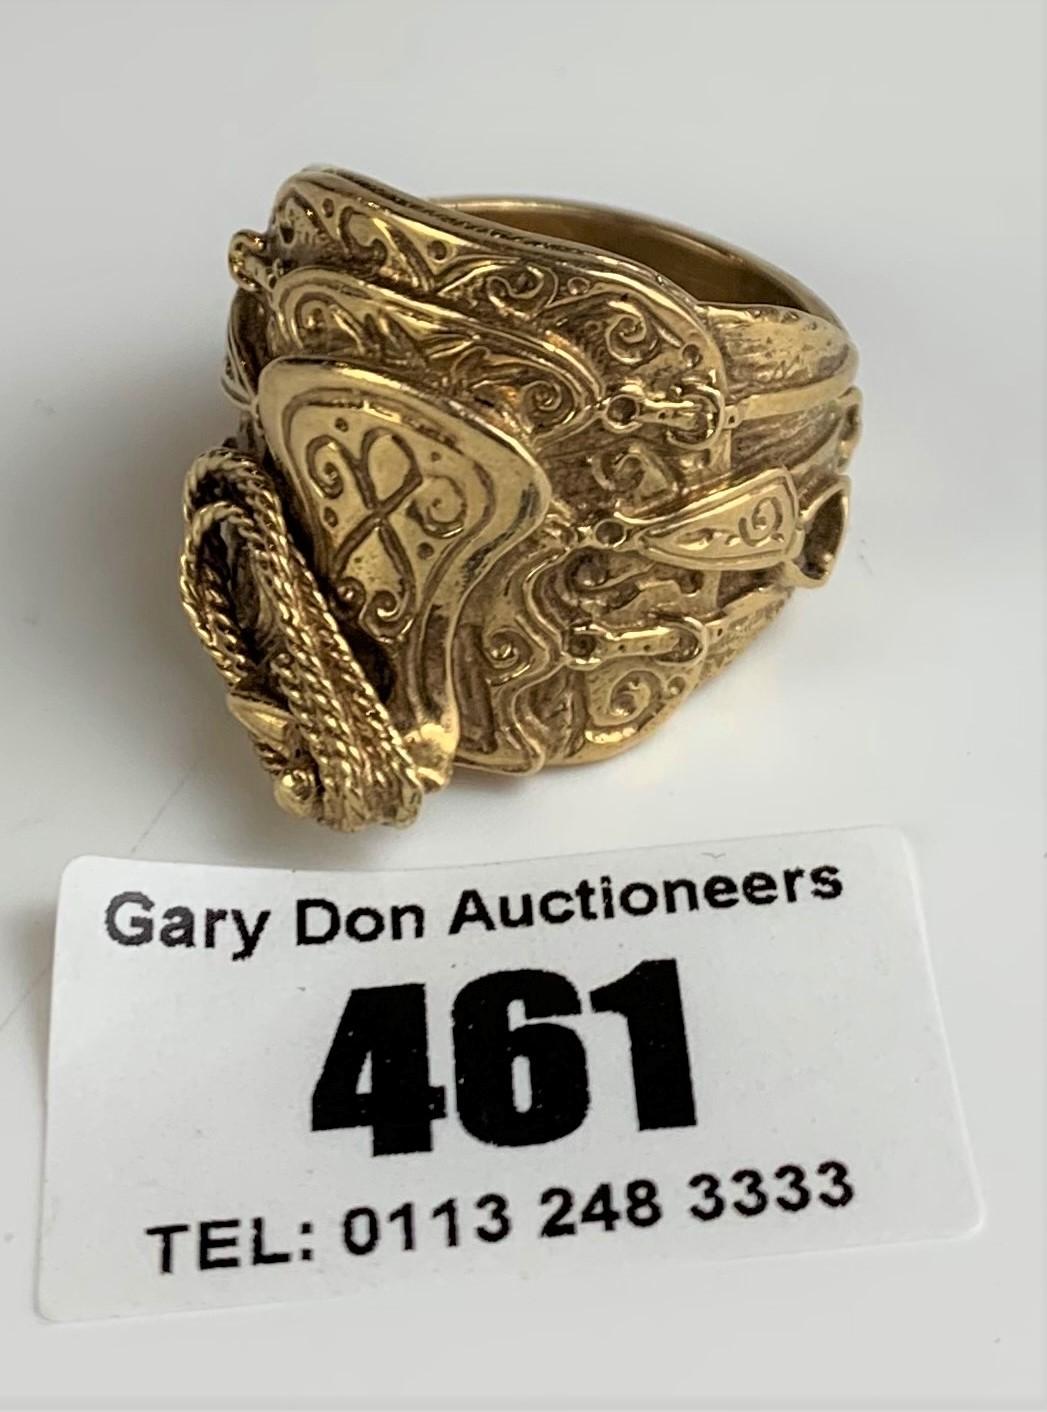 9k gold gents saddle ring, size Z+, w:26 gms - Image 4 of 6